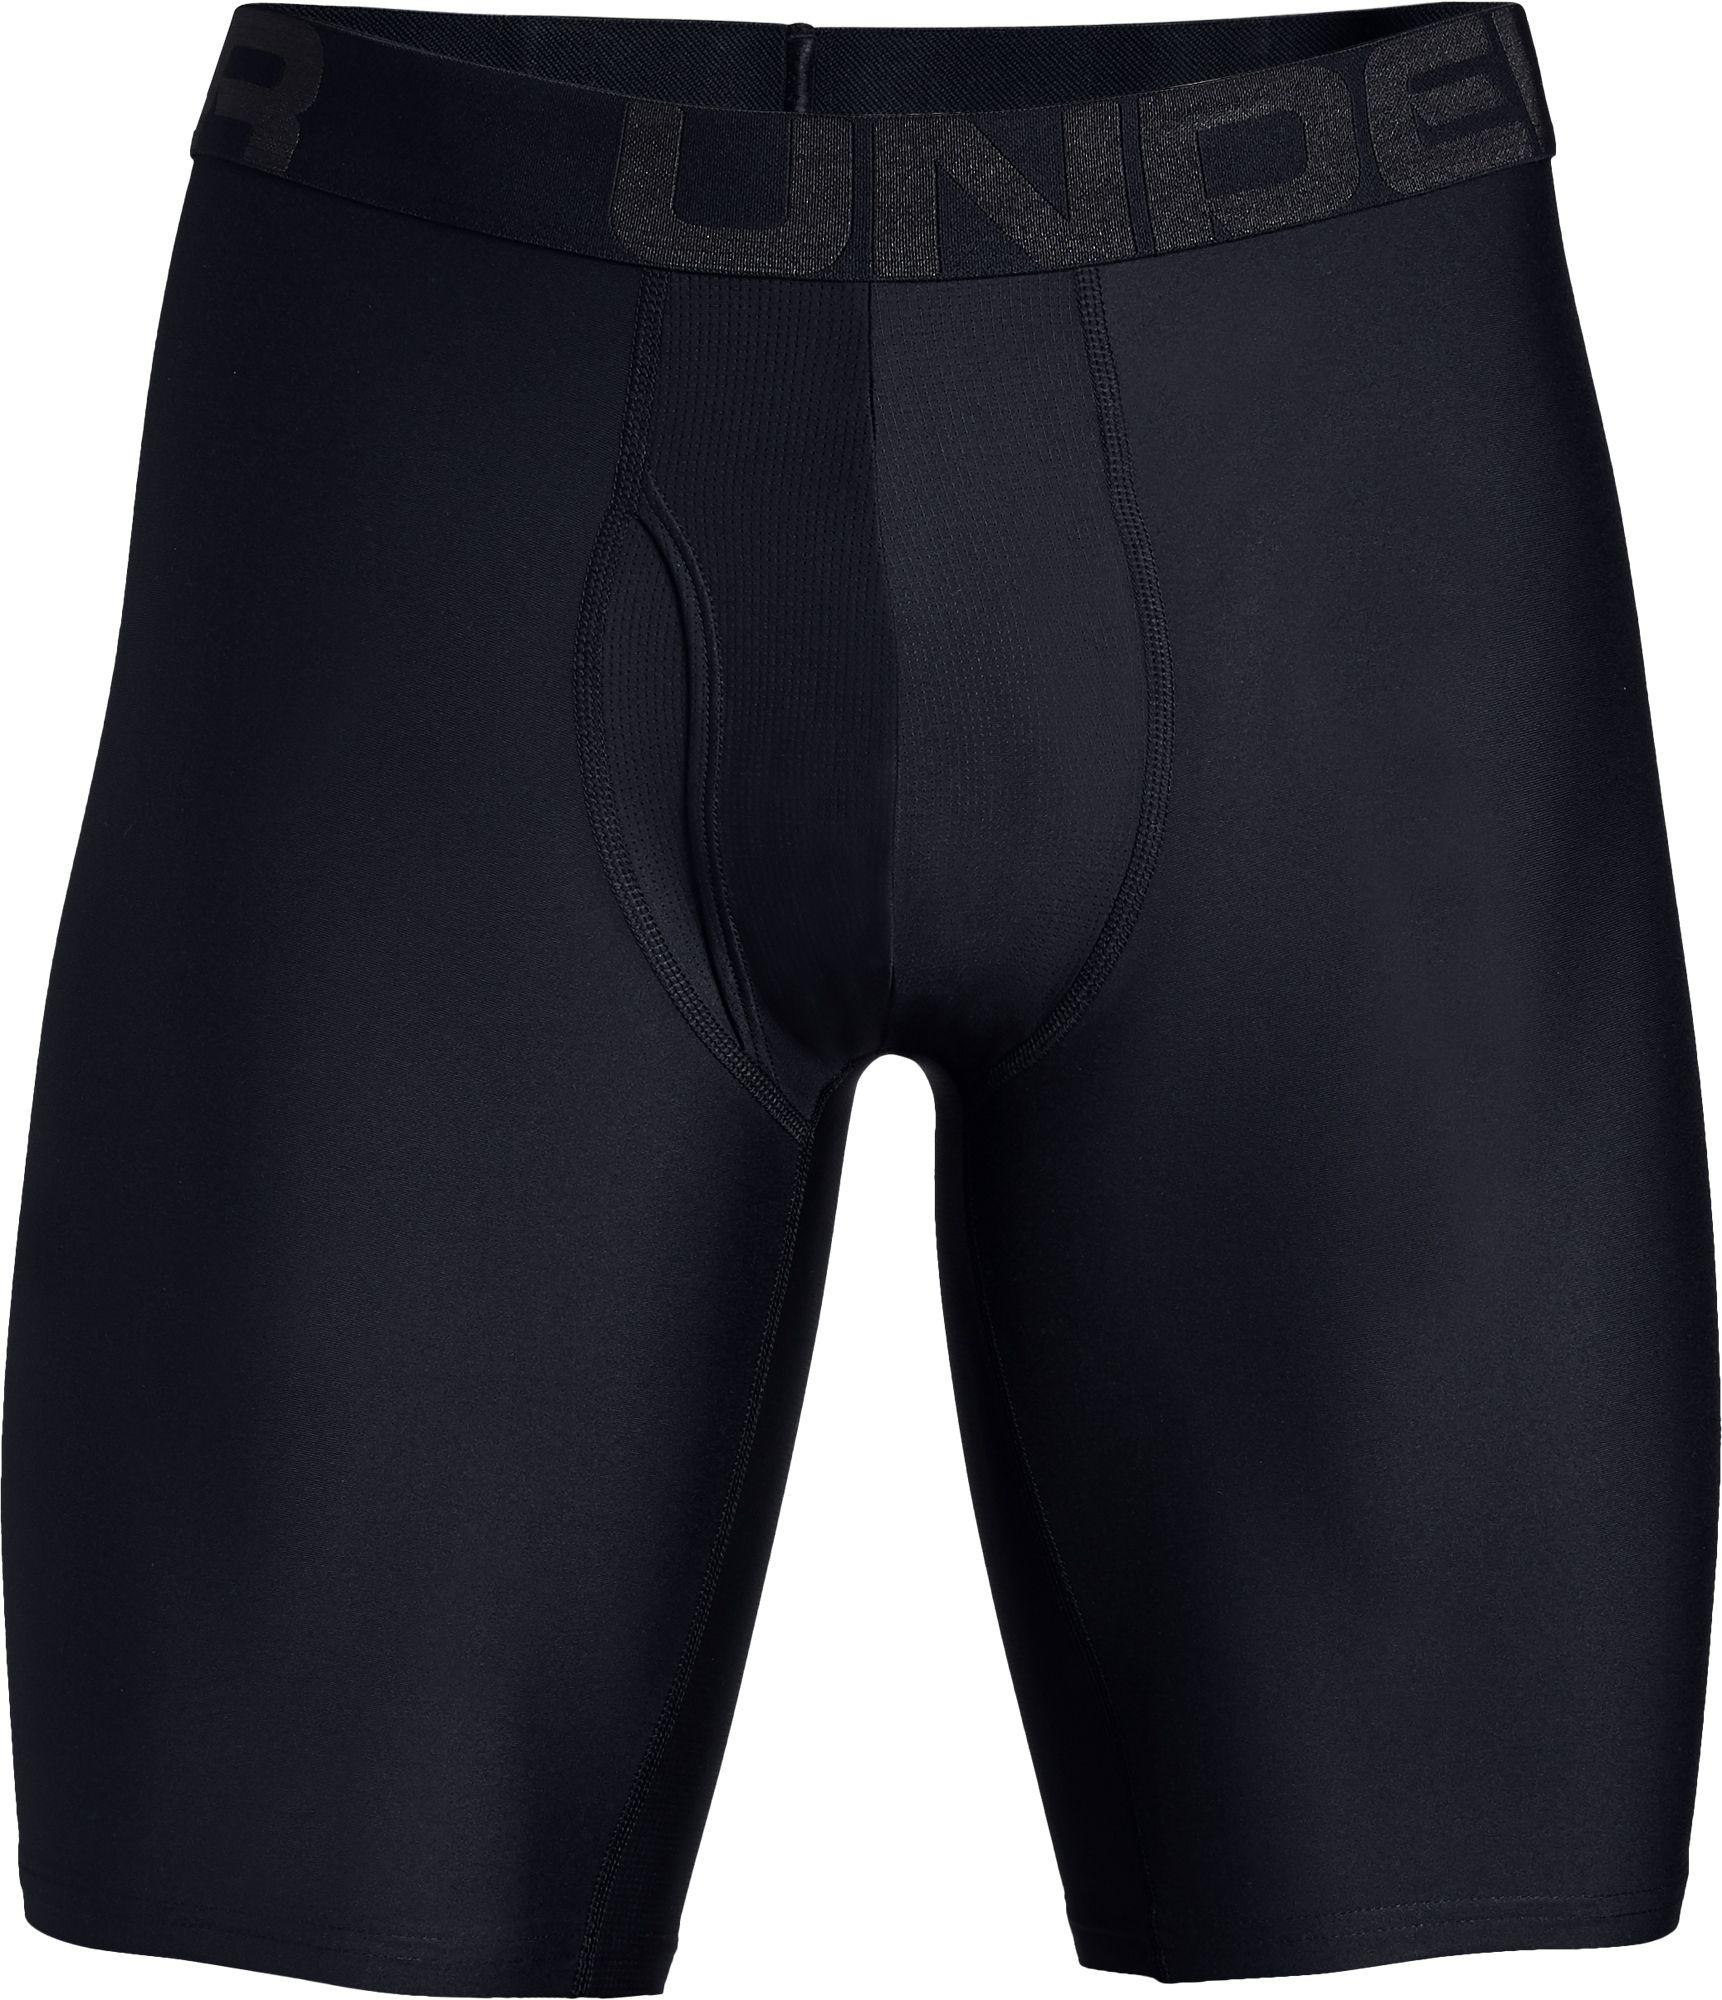 "2-Pack Under Armour 2019 Mens Tech 6/"" Soft Stretch BoxerJock Underwear Navy"